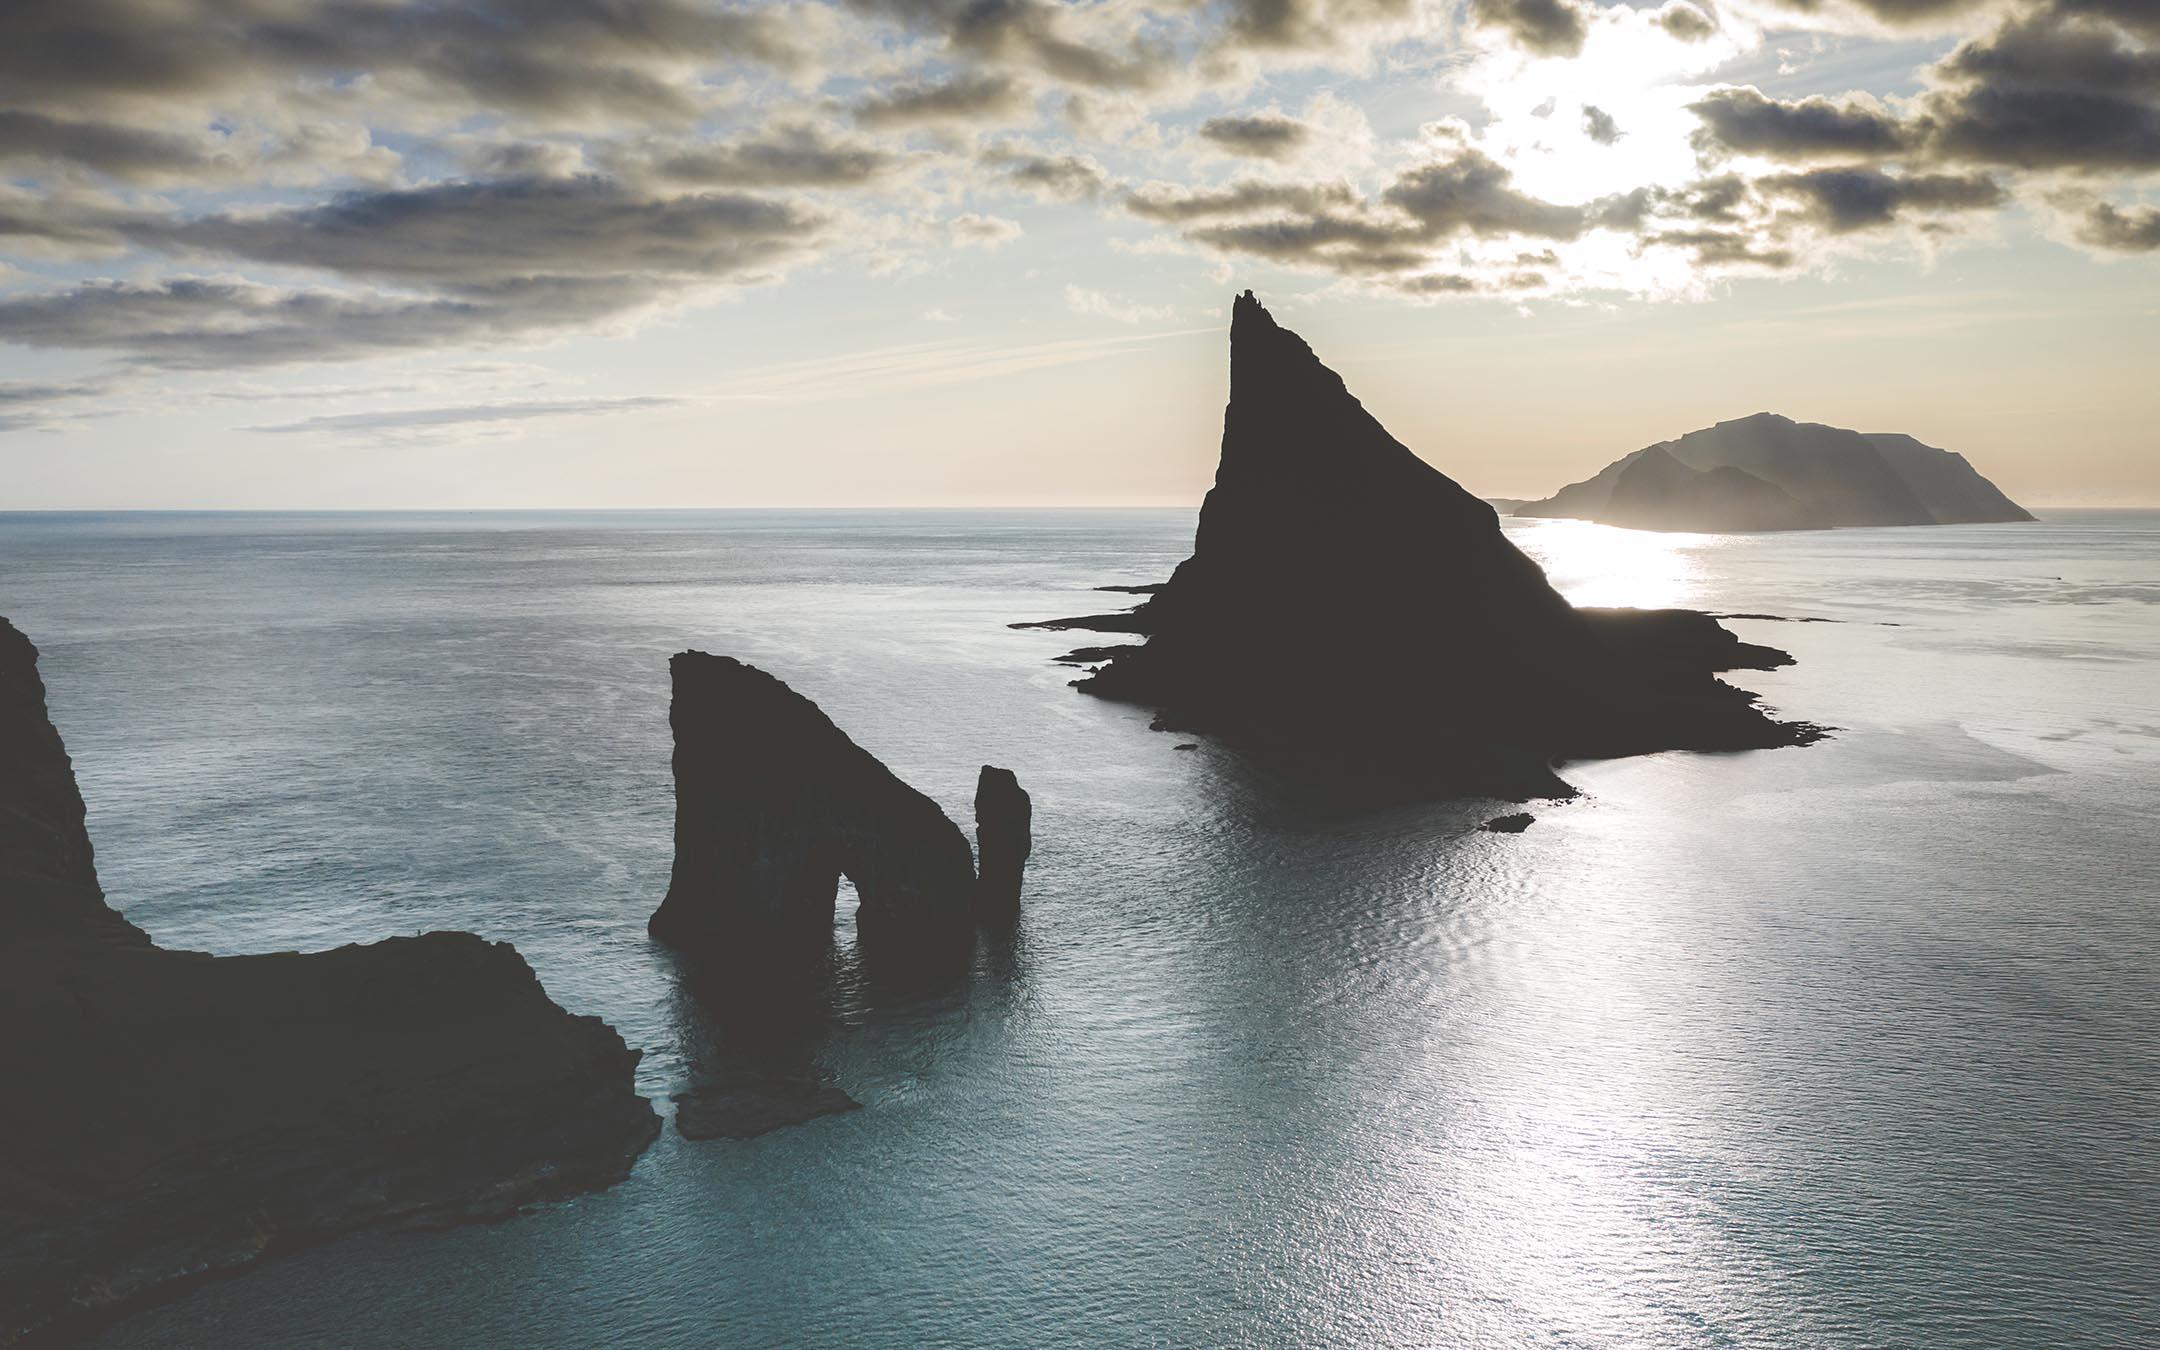 Drangarnir / Tindhólmur, Faroe Islands